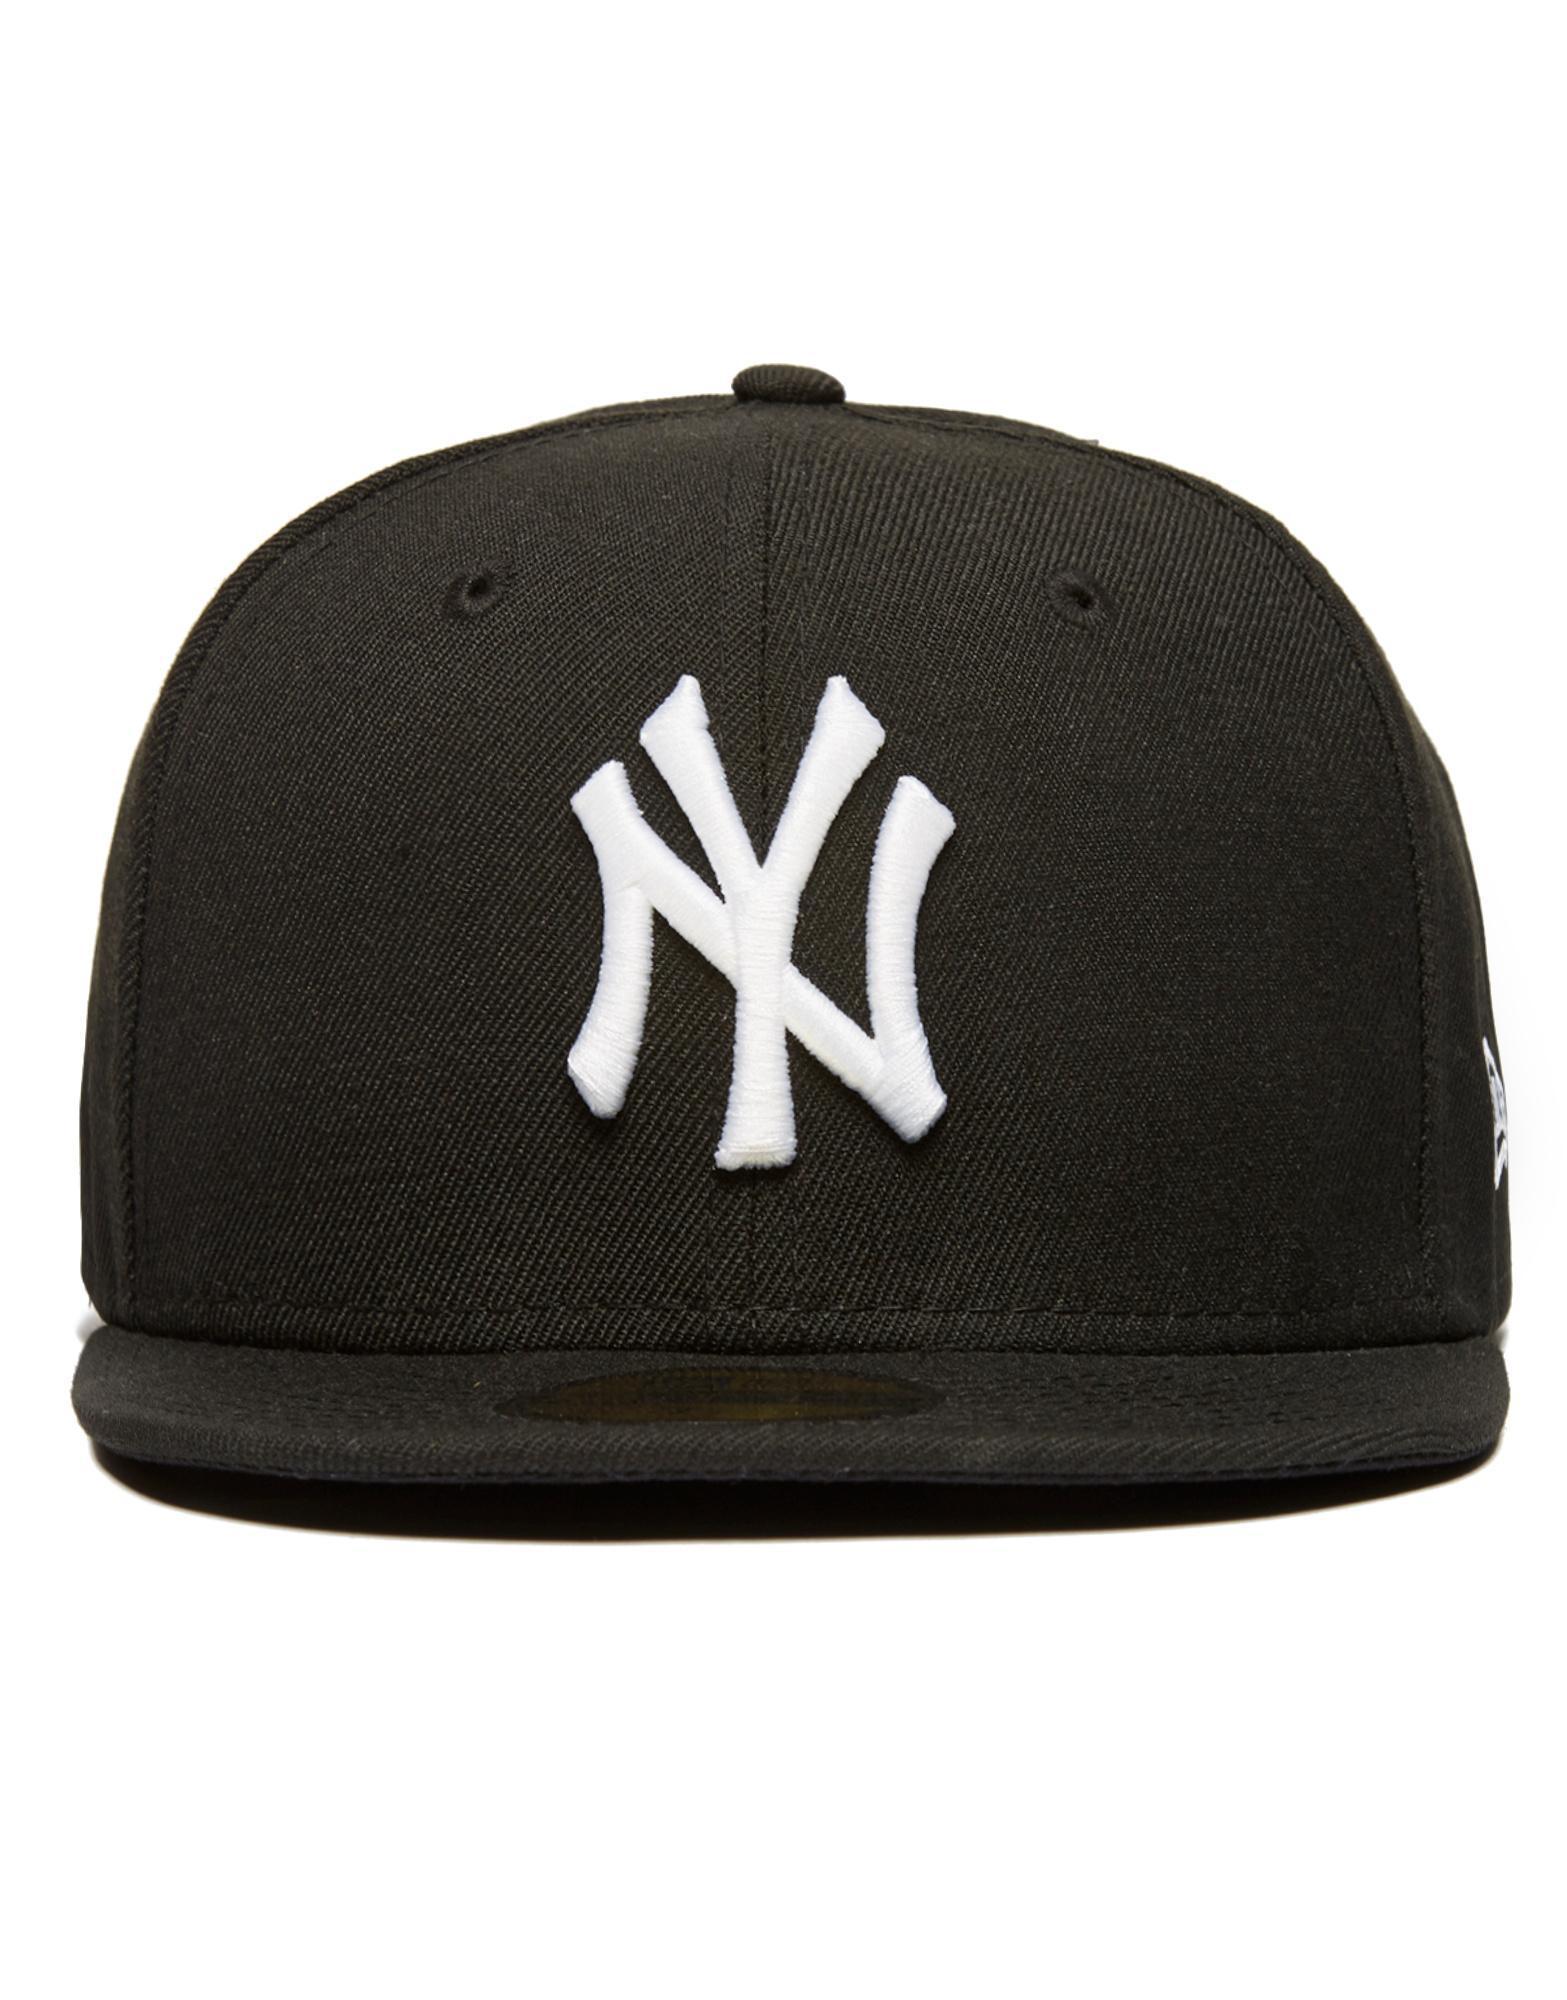 5f3edec8706 Lyst - KTZ Mlb New York Yankees 59fifty Fitted Cap in Black for Men